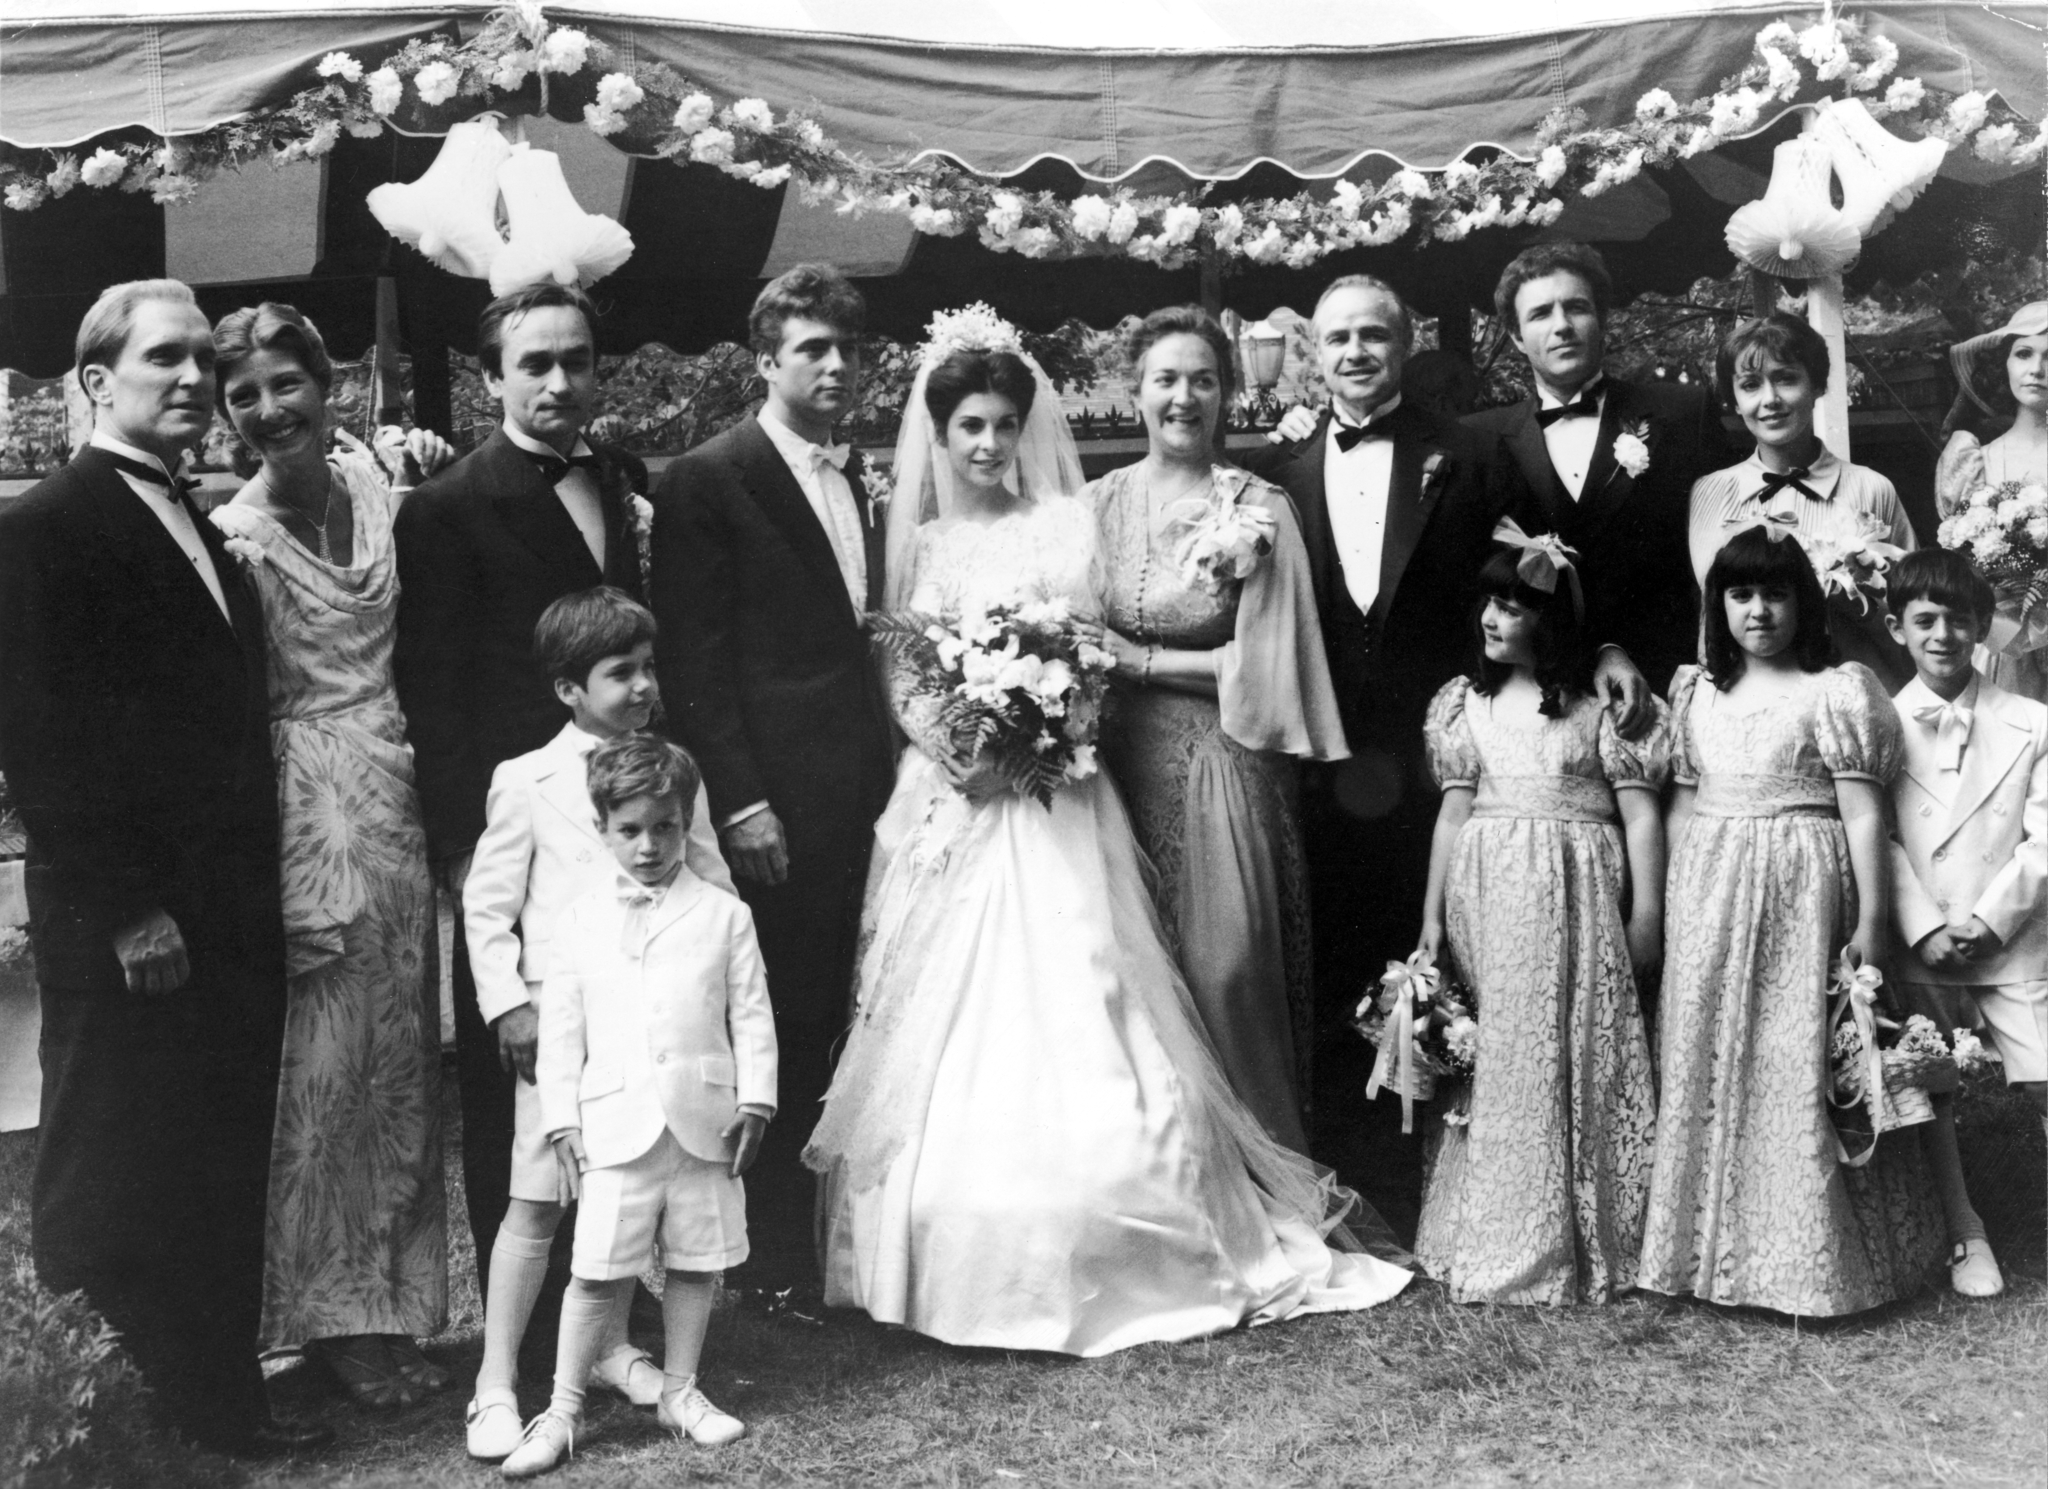 Marlon Brando, Robert Duvall, James Caan, John Cazale, Talia Shire, Julie Gregg, Morgana King, Tere Livrano, and Gianni Russo in The Godfather (1972)